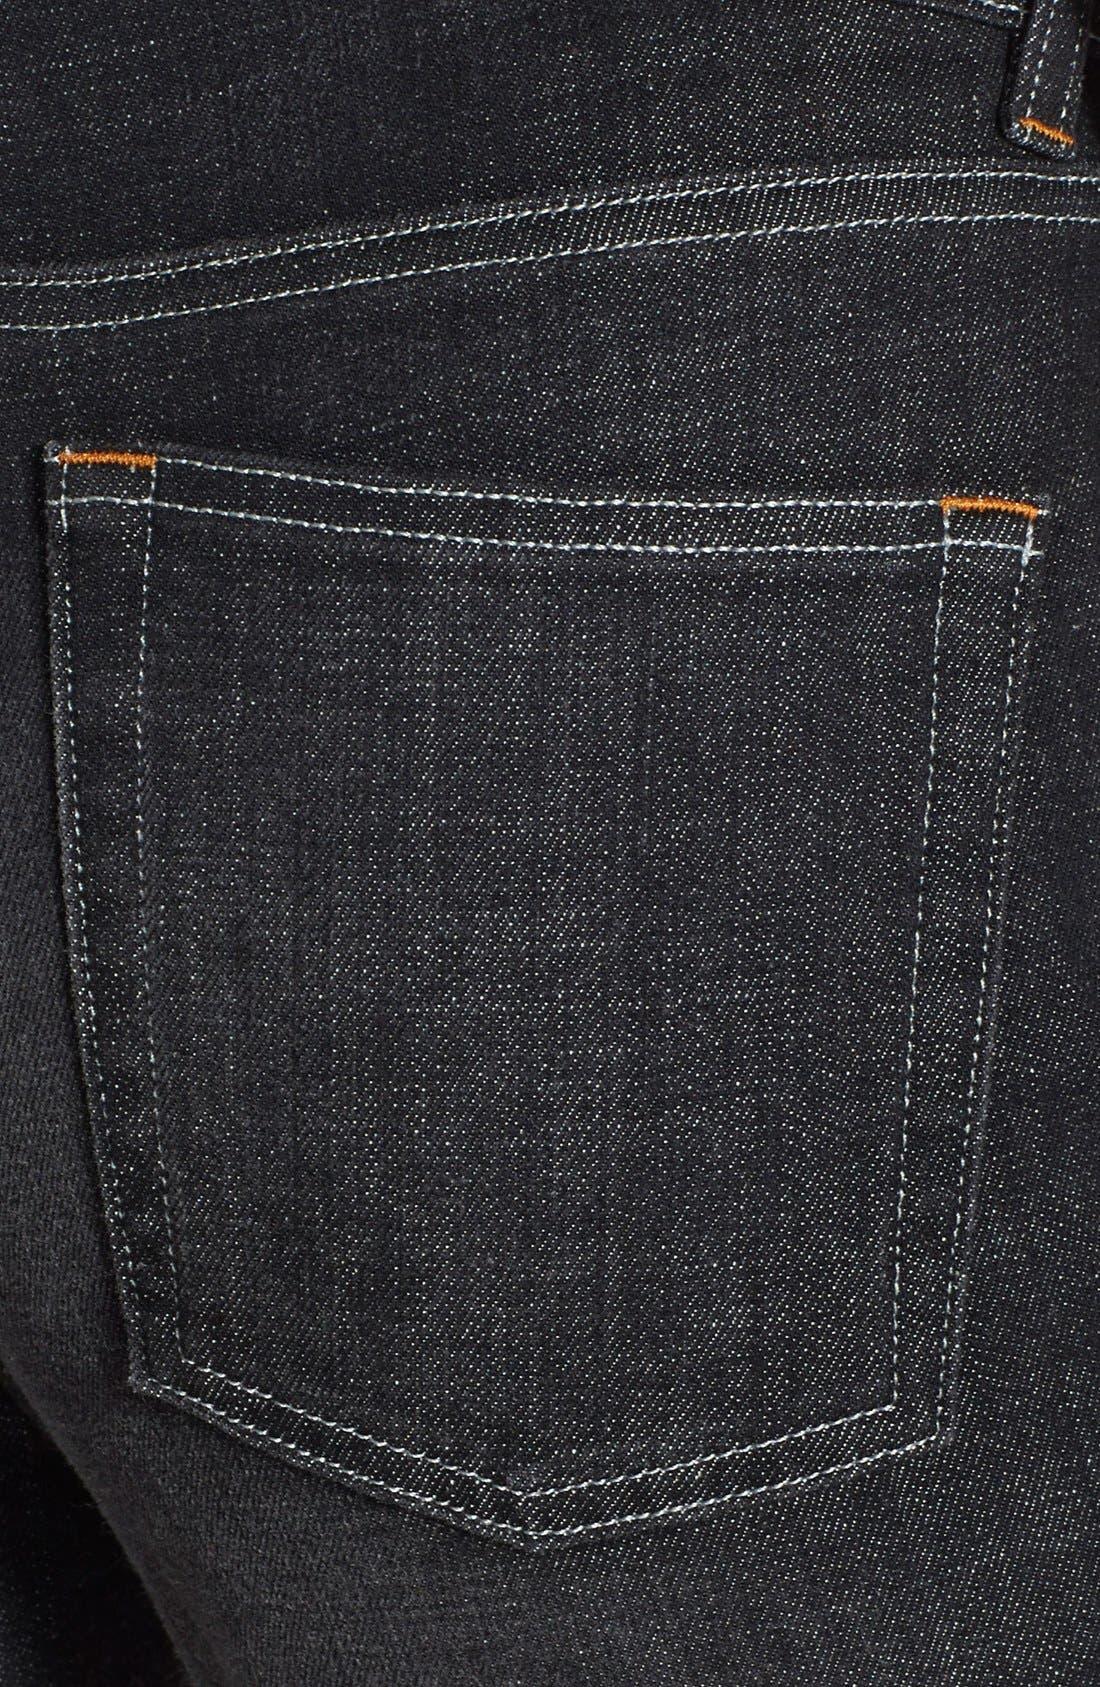 Alternate Image 3  - Eileen Fisher Organic Cotton Boyfriend Jeans (Plus Size)